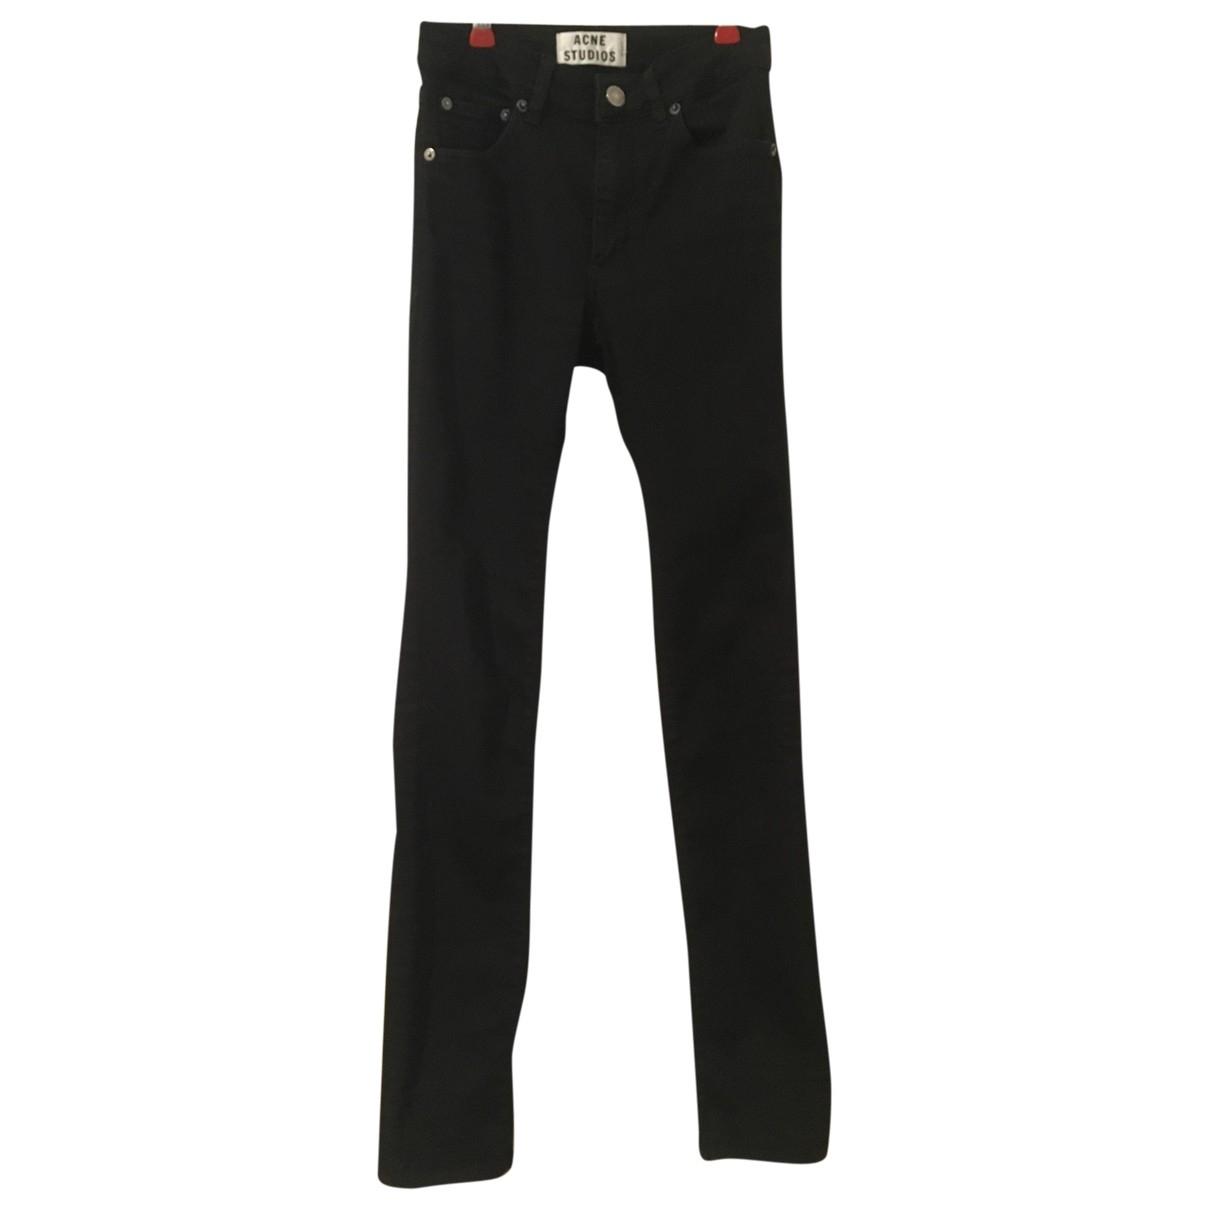 Acne Studios \N Black Cotton - elasthane Jeans for Women 25 US